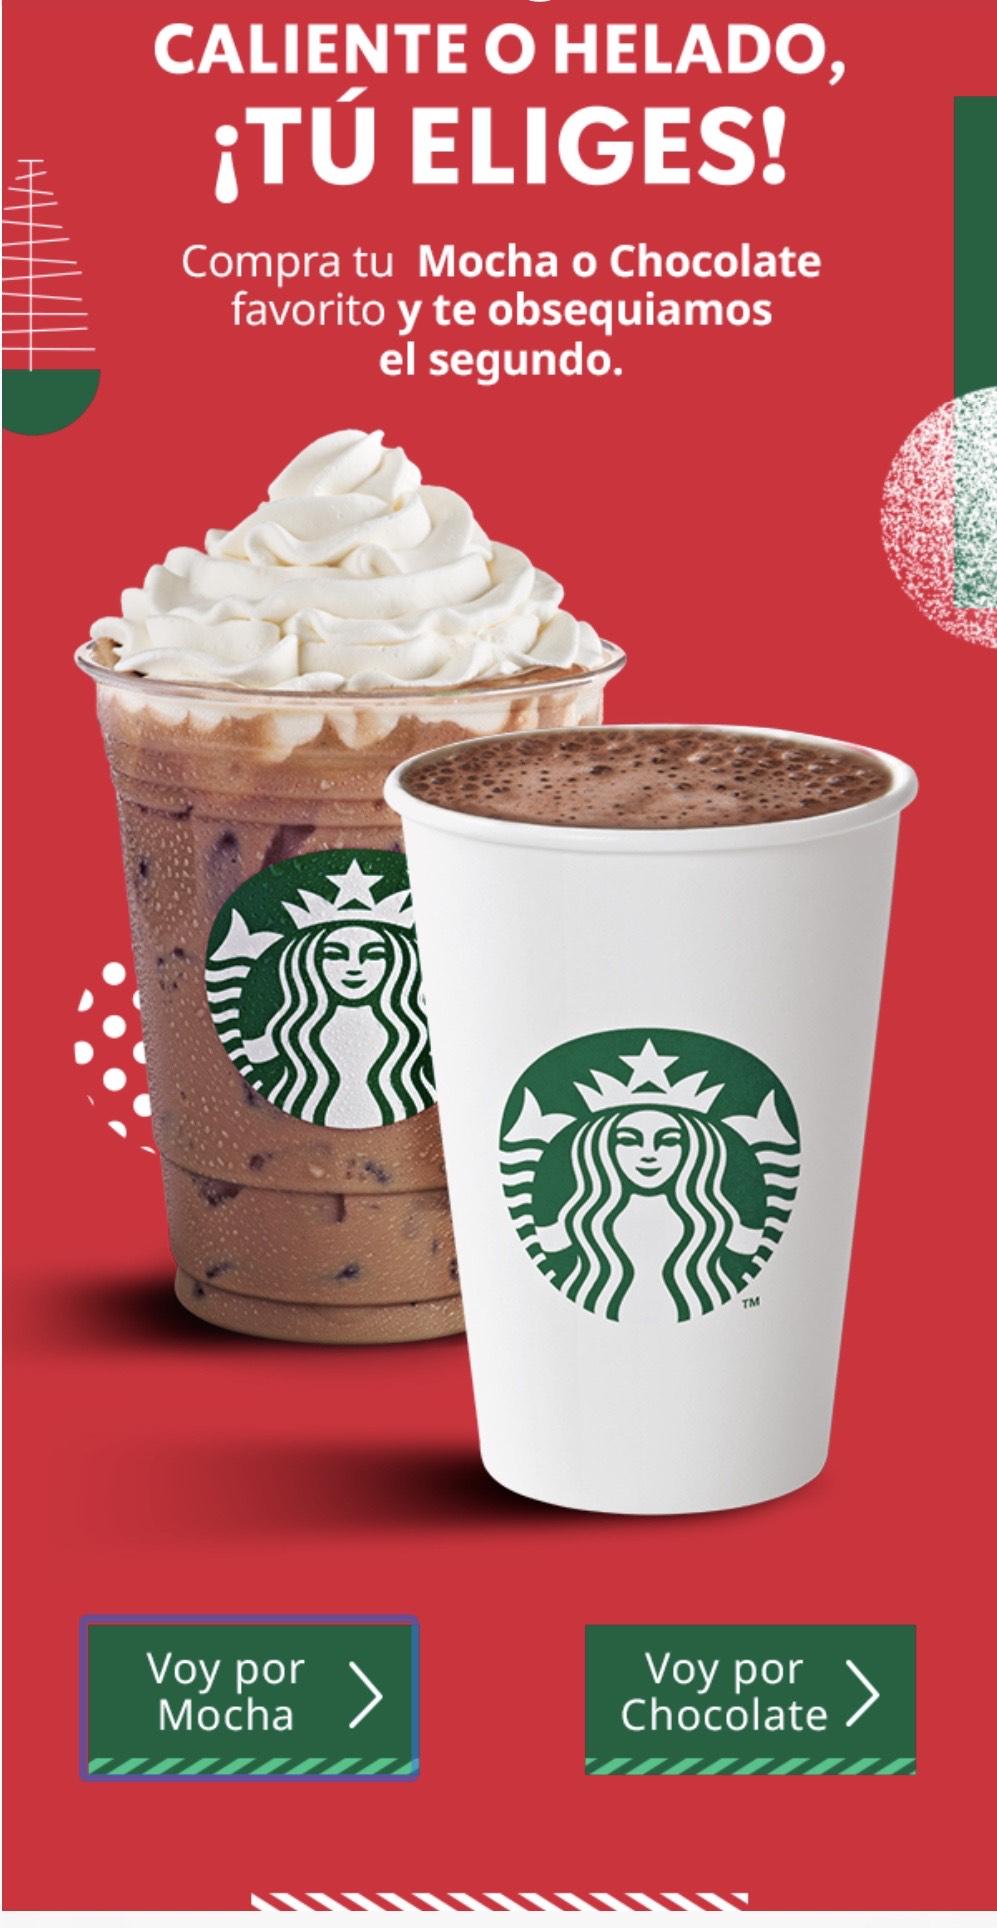 Starbucks: al comprar o mocha o chocolate, te regalan el segundo.